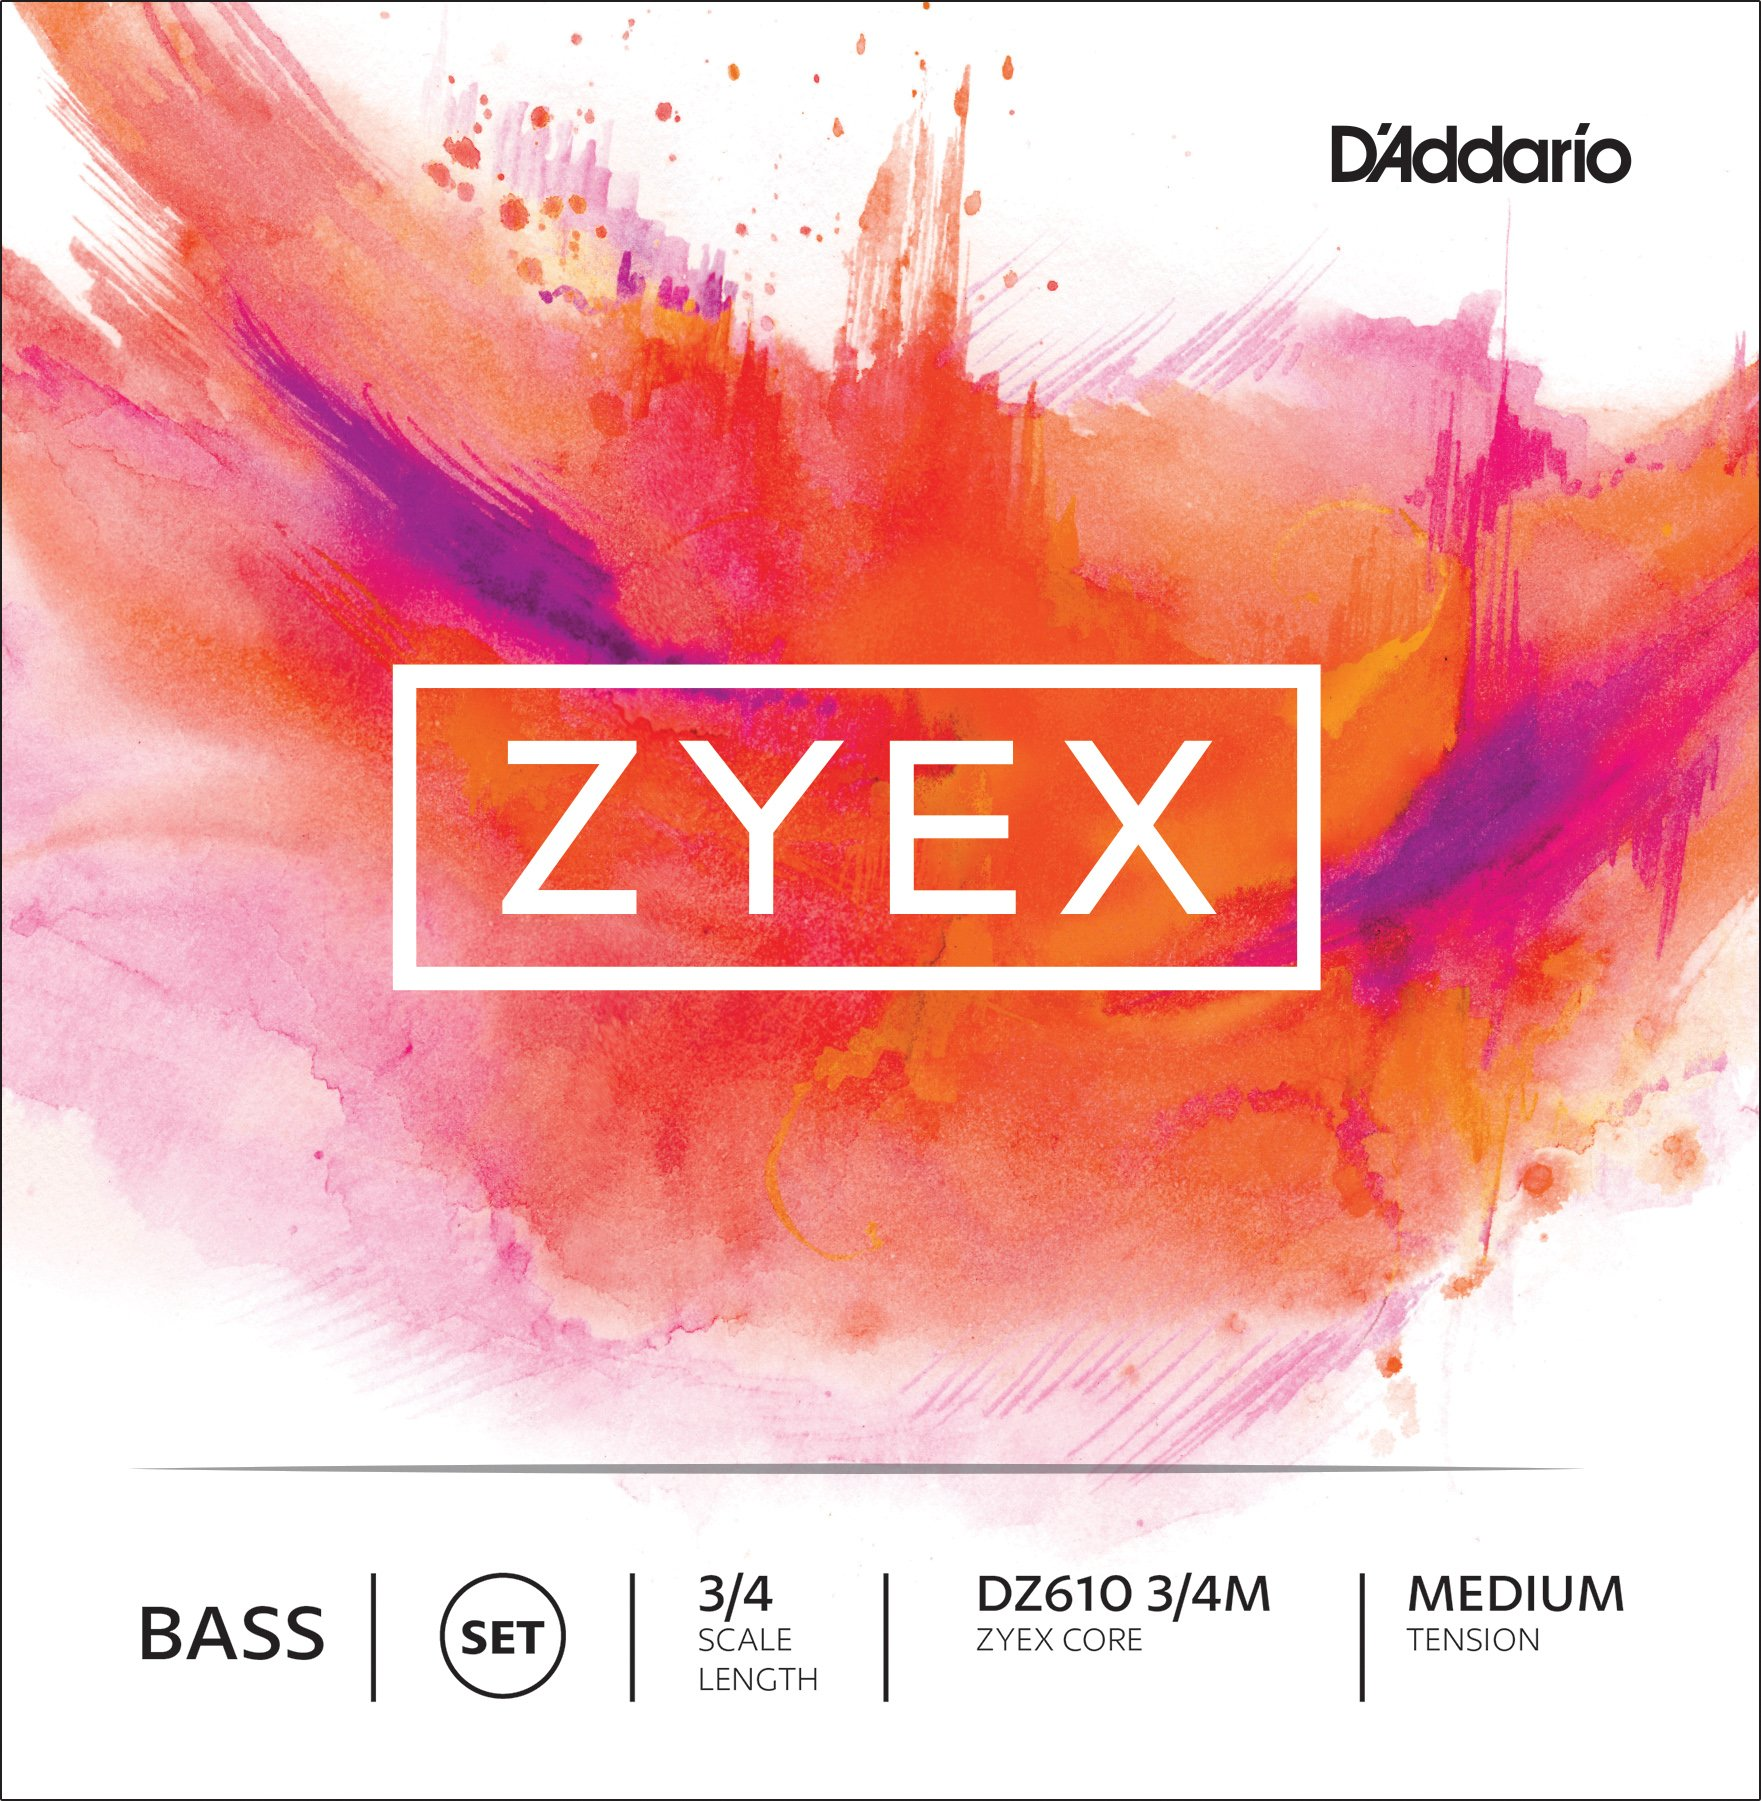 D'Addario Zyex Bass String Set, 3/4 Scale, Medium Tension